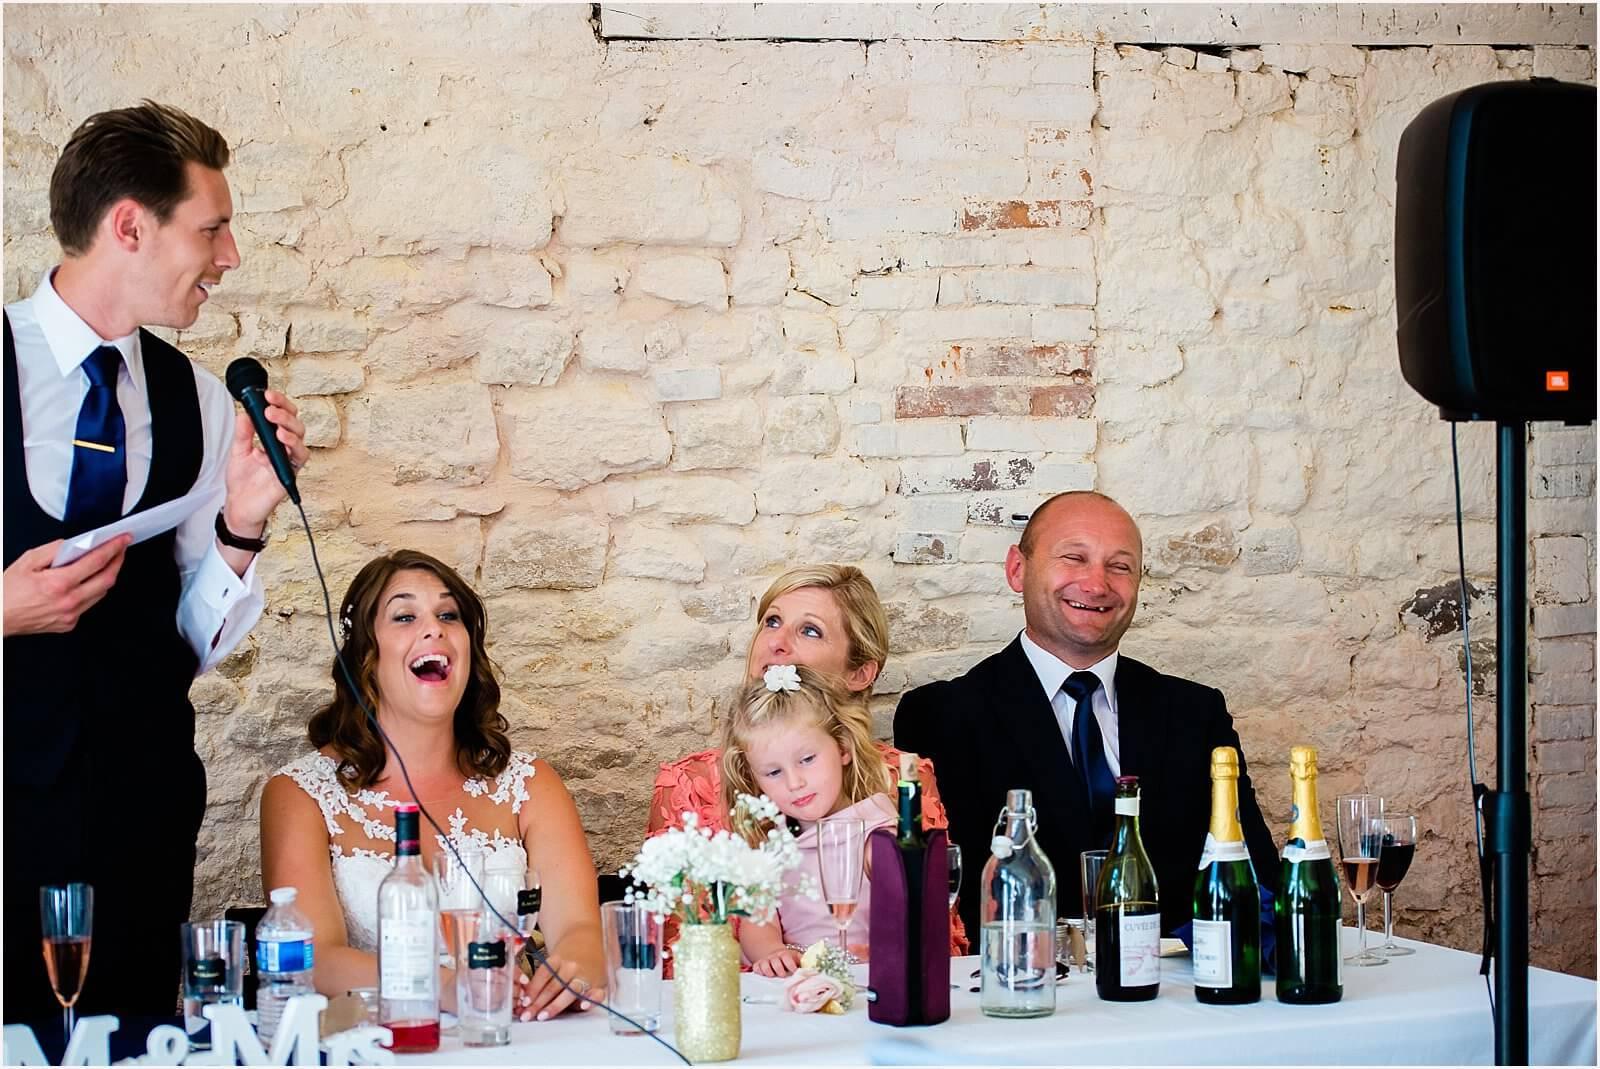 Chateau de Courtomer Wedding | Chantel & Evan 44